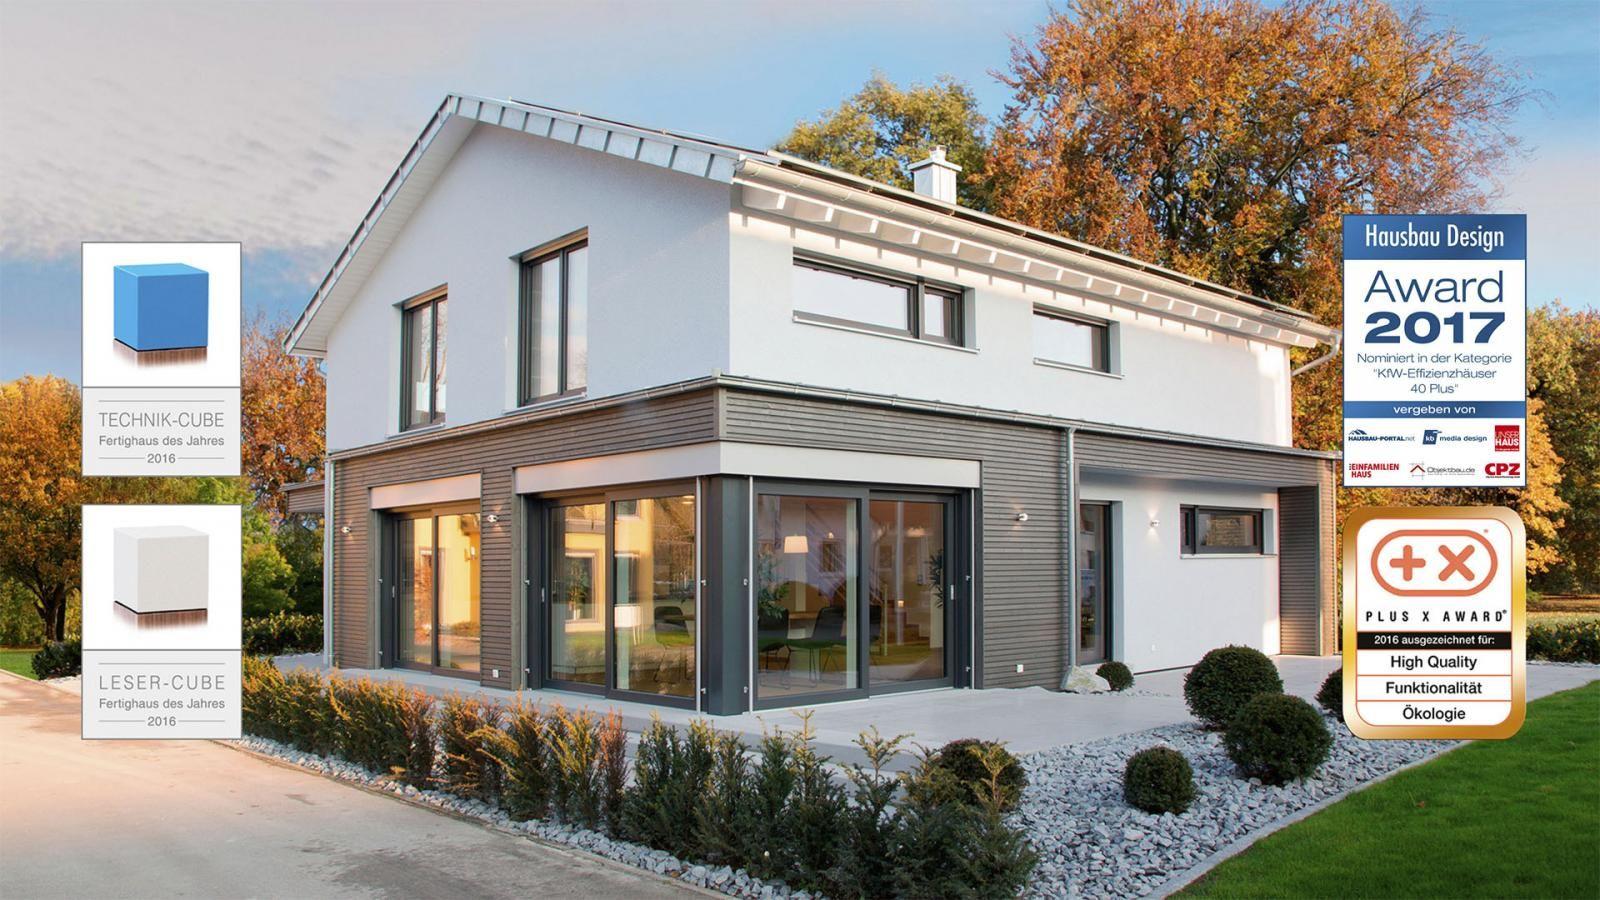 musterhaus ulm f r den hausbau design award nominiert kategorie kfw effizienzh user 40 plus. Black Bedroom Furniture Sets. Home Design Ideas